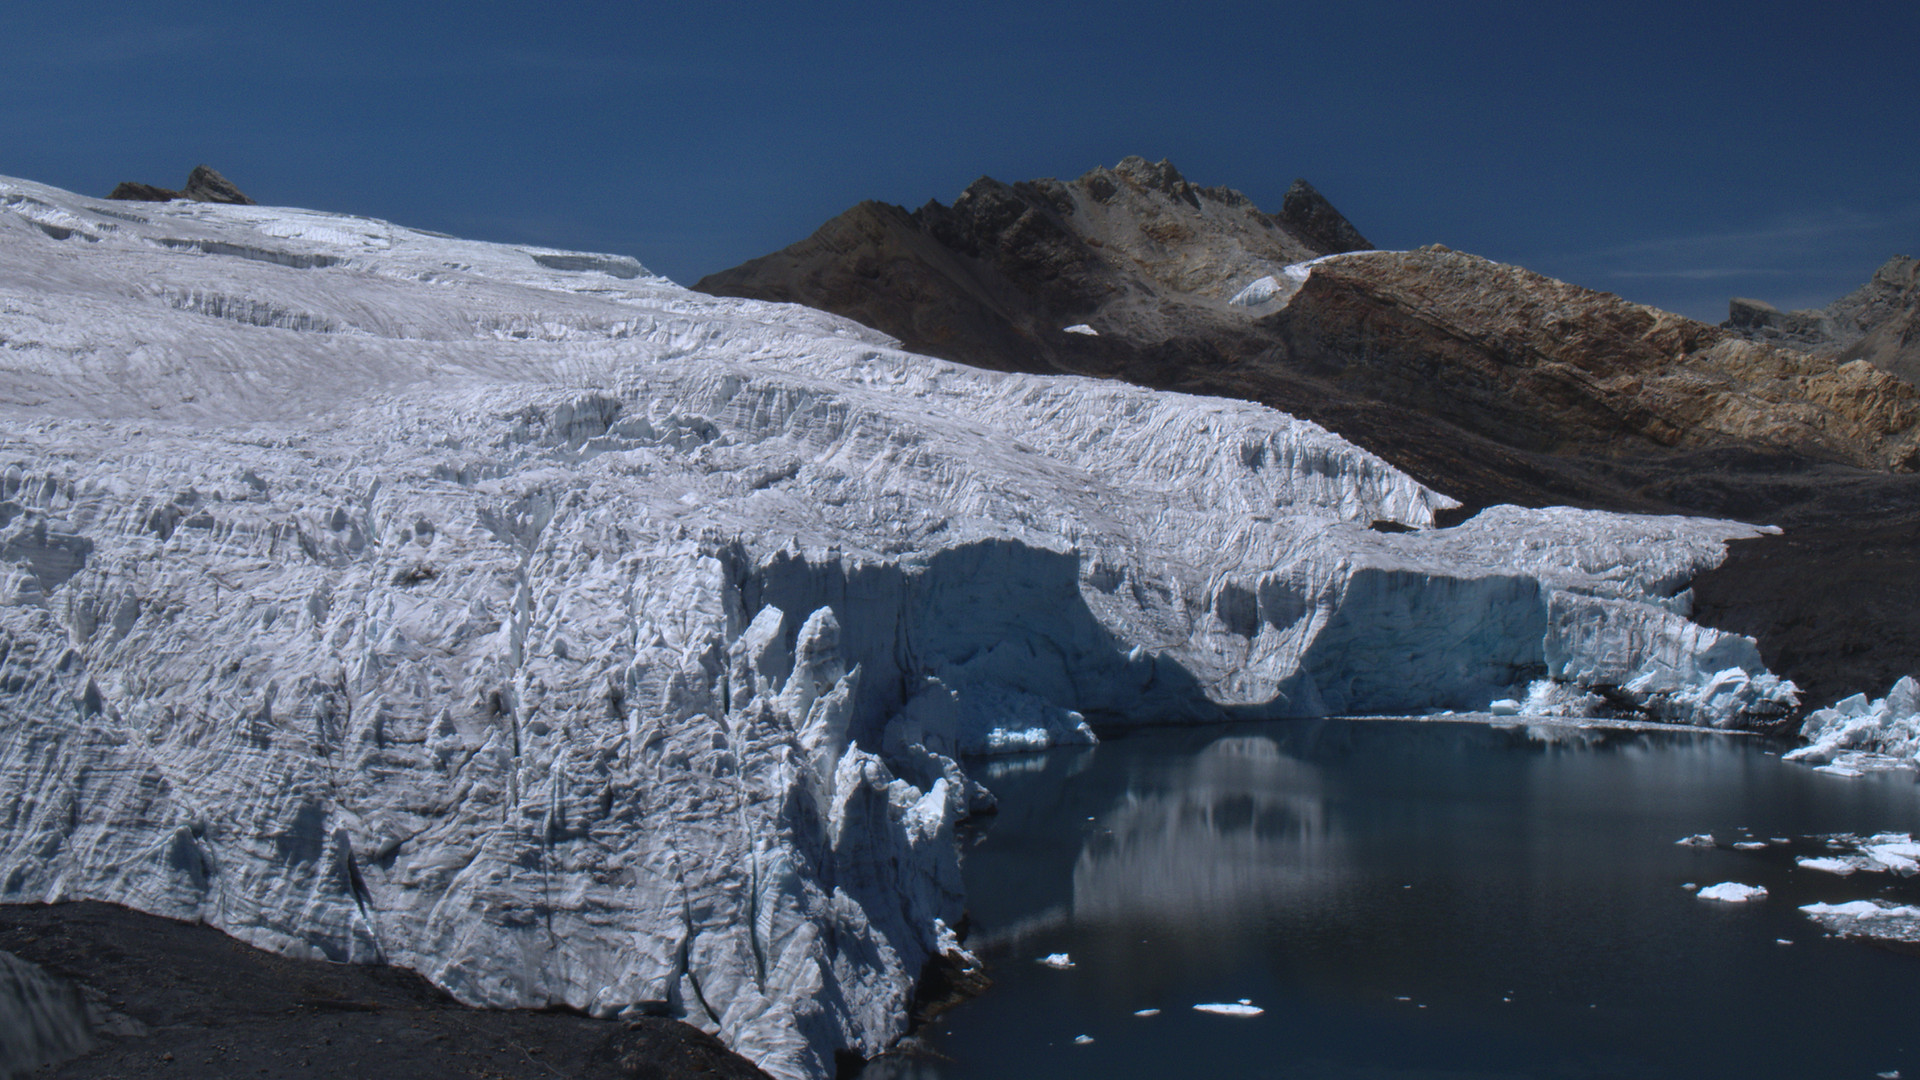 TWA_Ep1_25_glacier.jpg